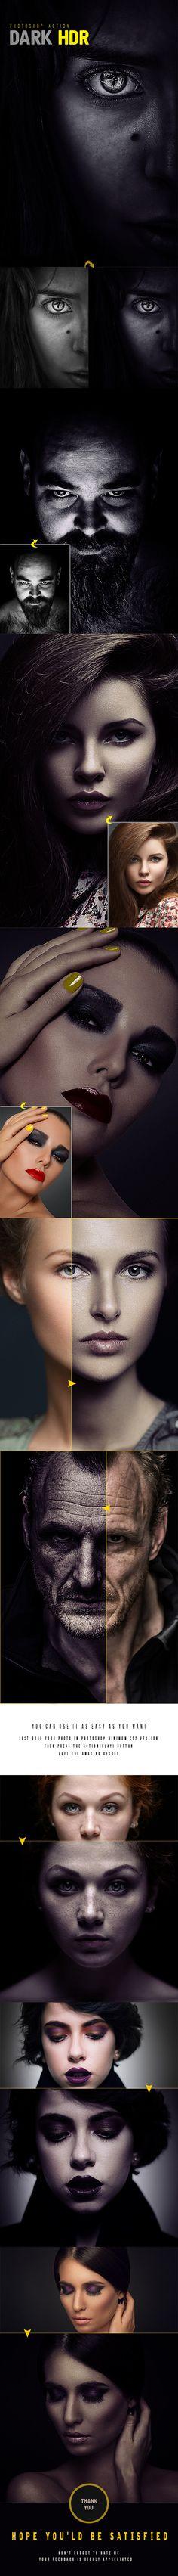 Dark HDR Photoshop Action #photoeffect Download: http://graphicriver.net/item/dark-hdr-photoshop-action/11315371?ref=ksioks